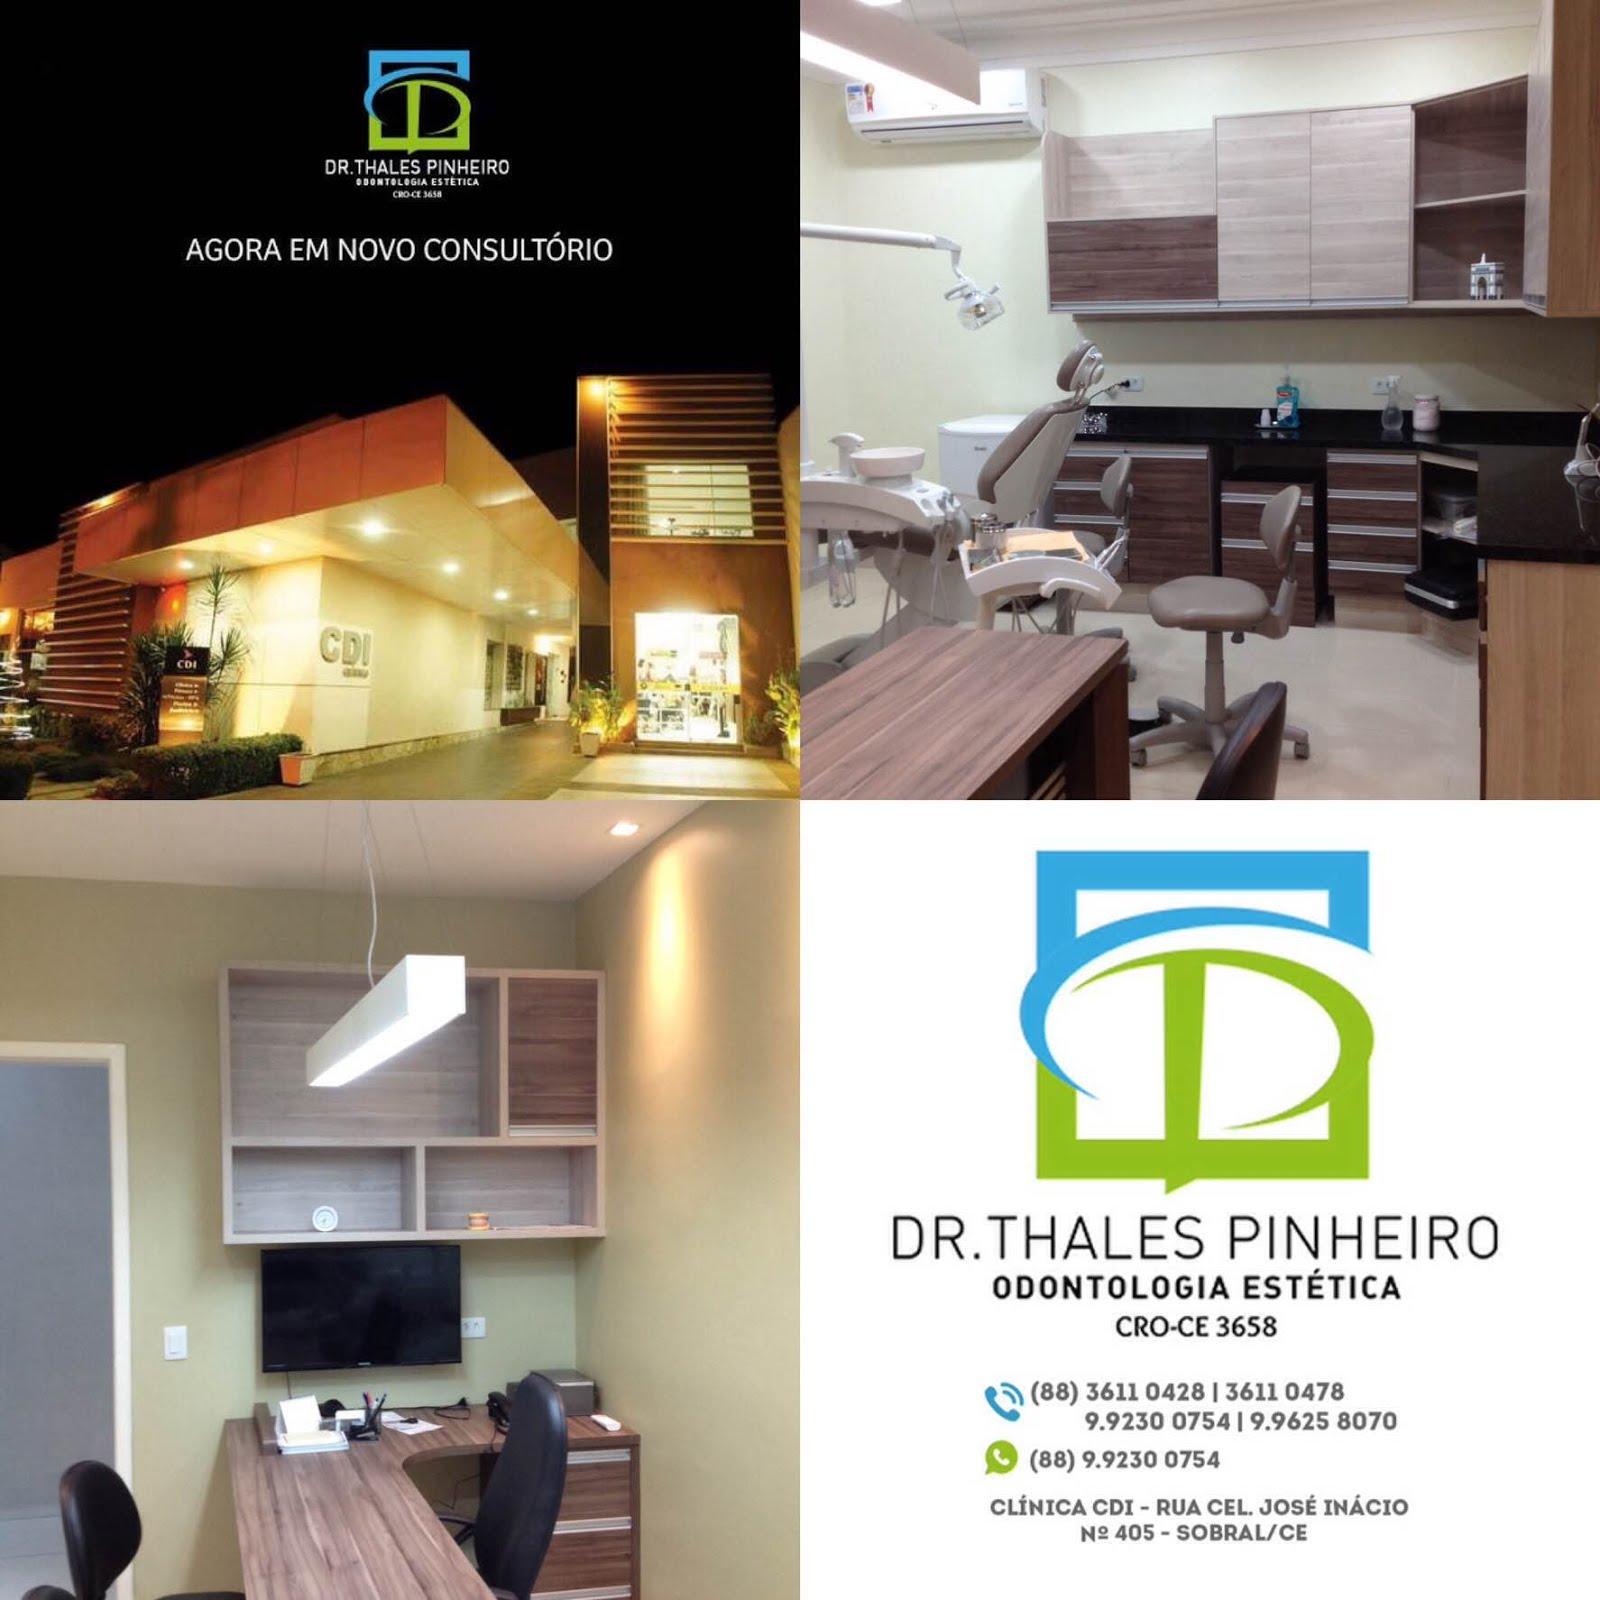 Thales Pinheiro